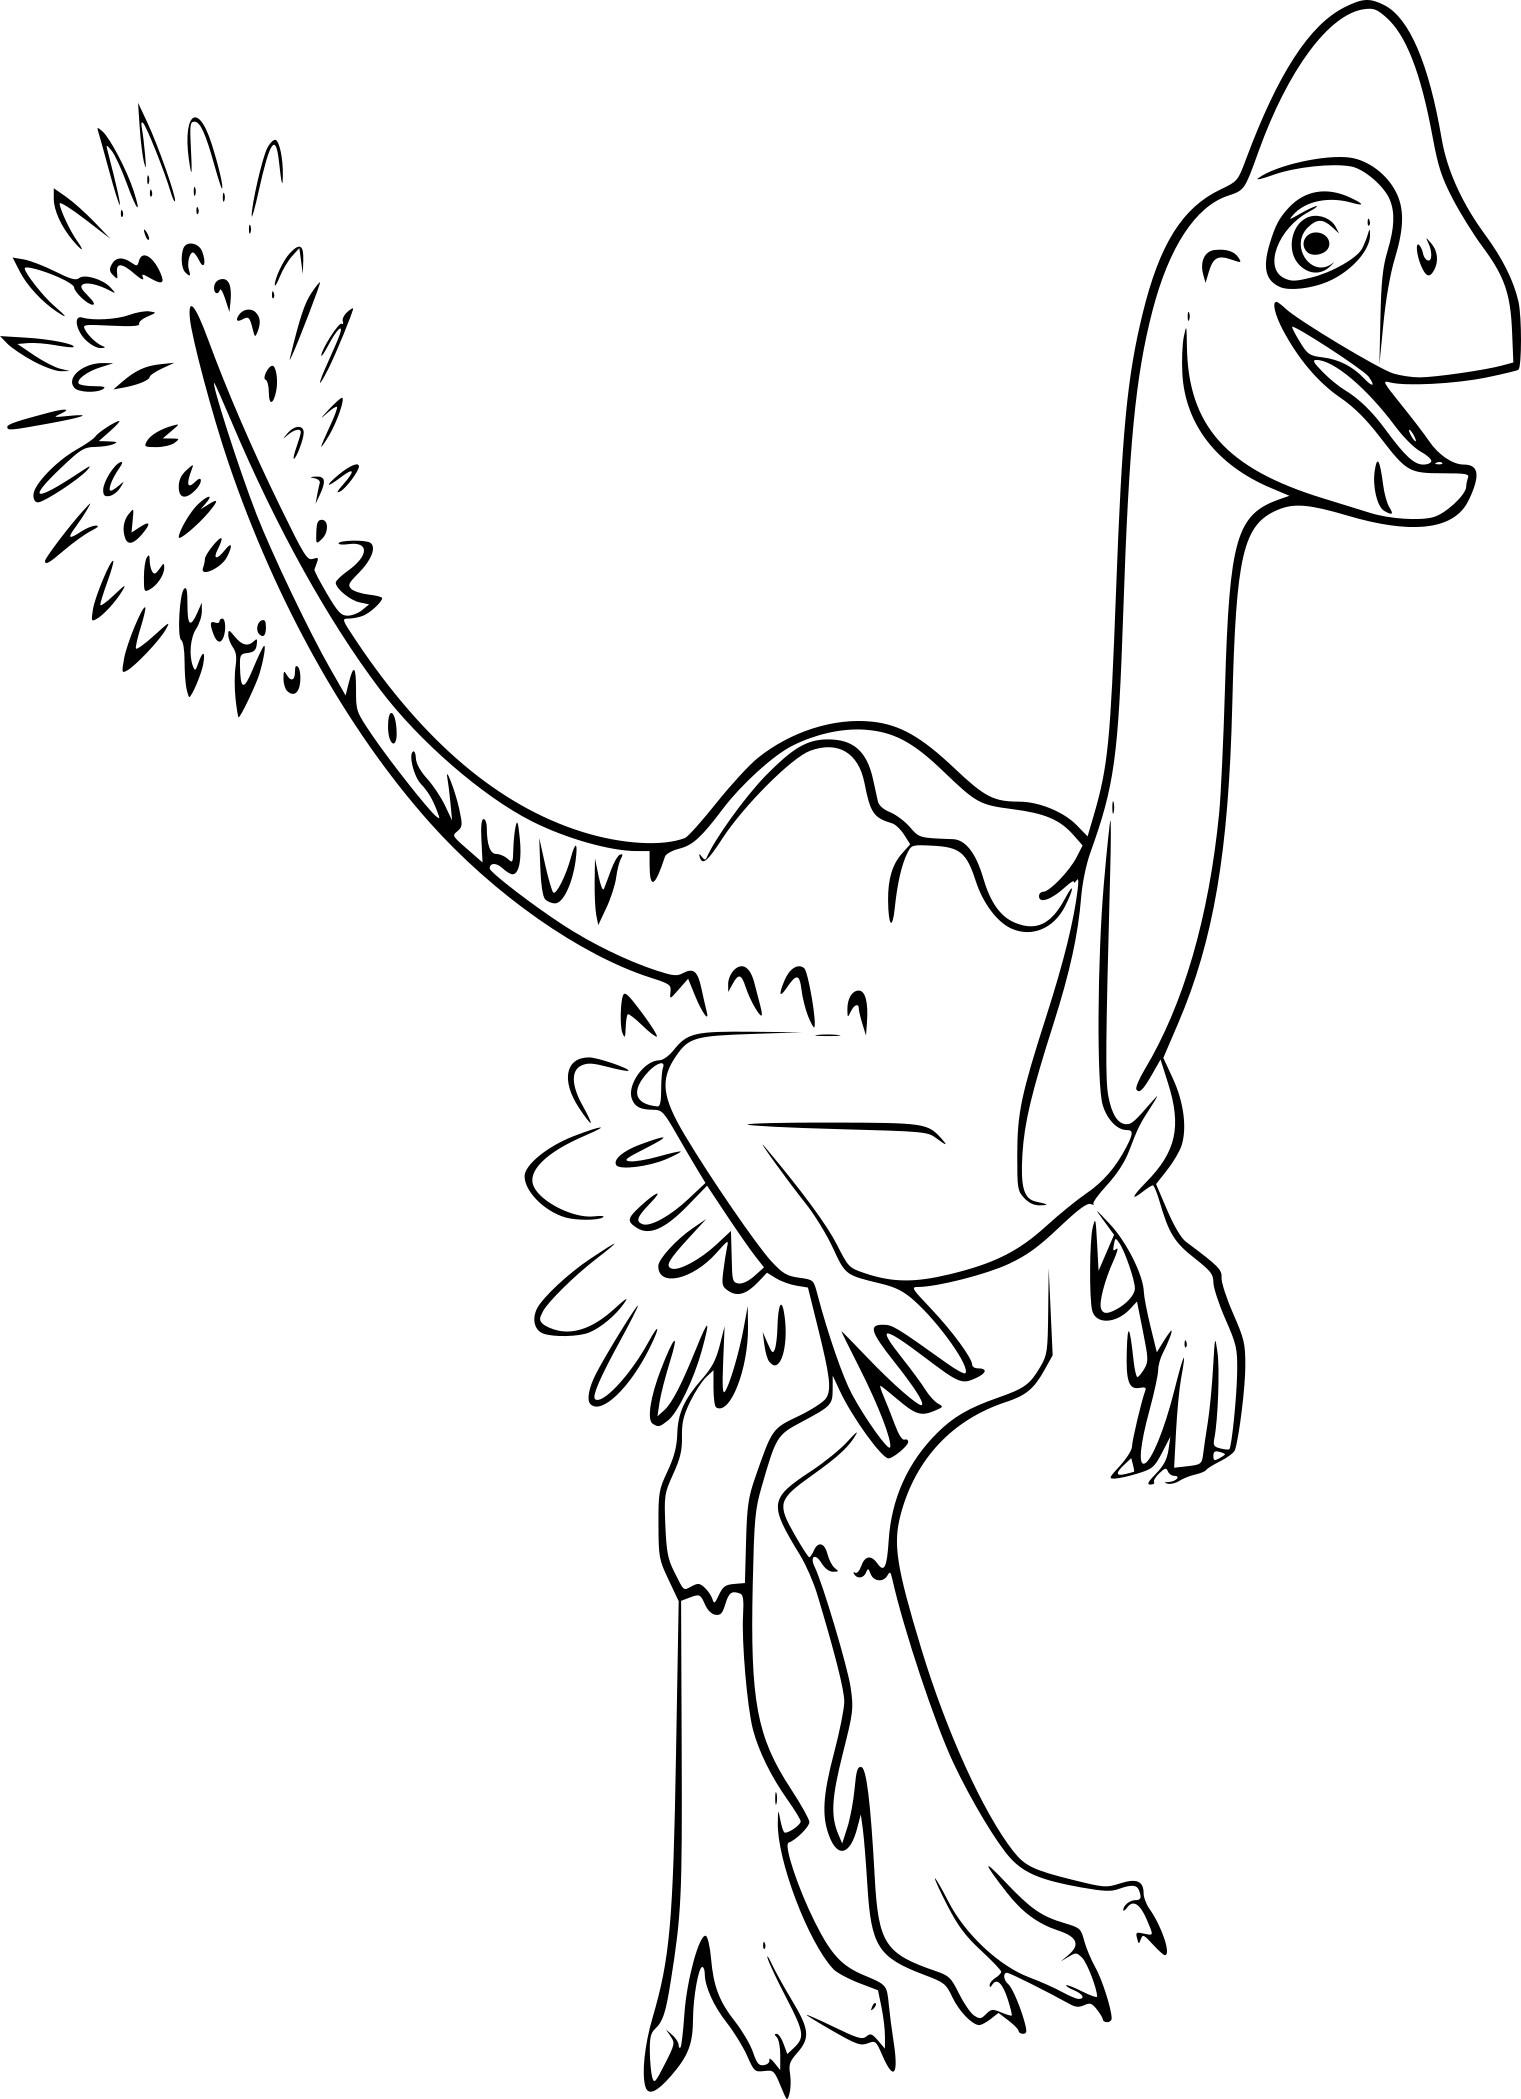 Coloriage Oviraptor Dinosaure À Imprimer pour Coloriage Dinosaure Imprimer